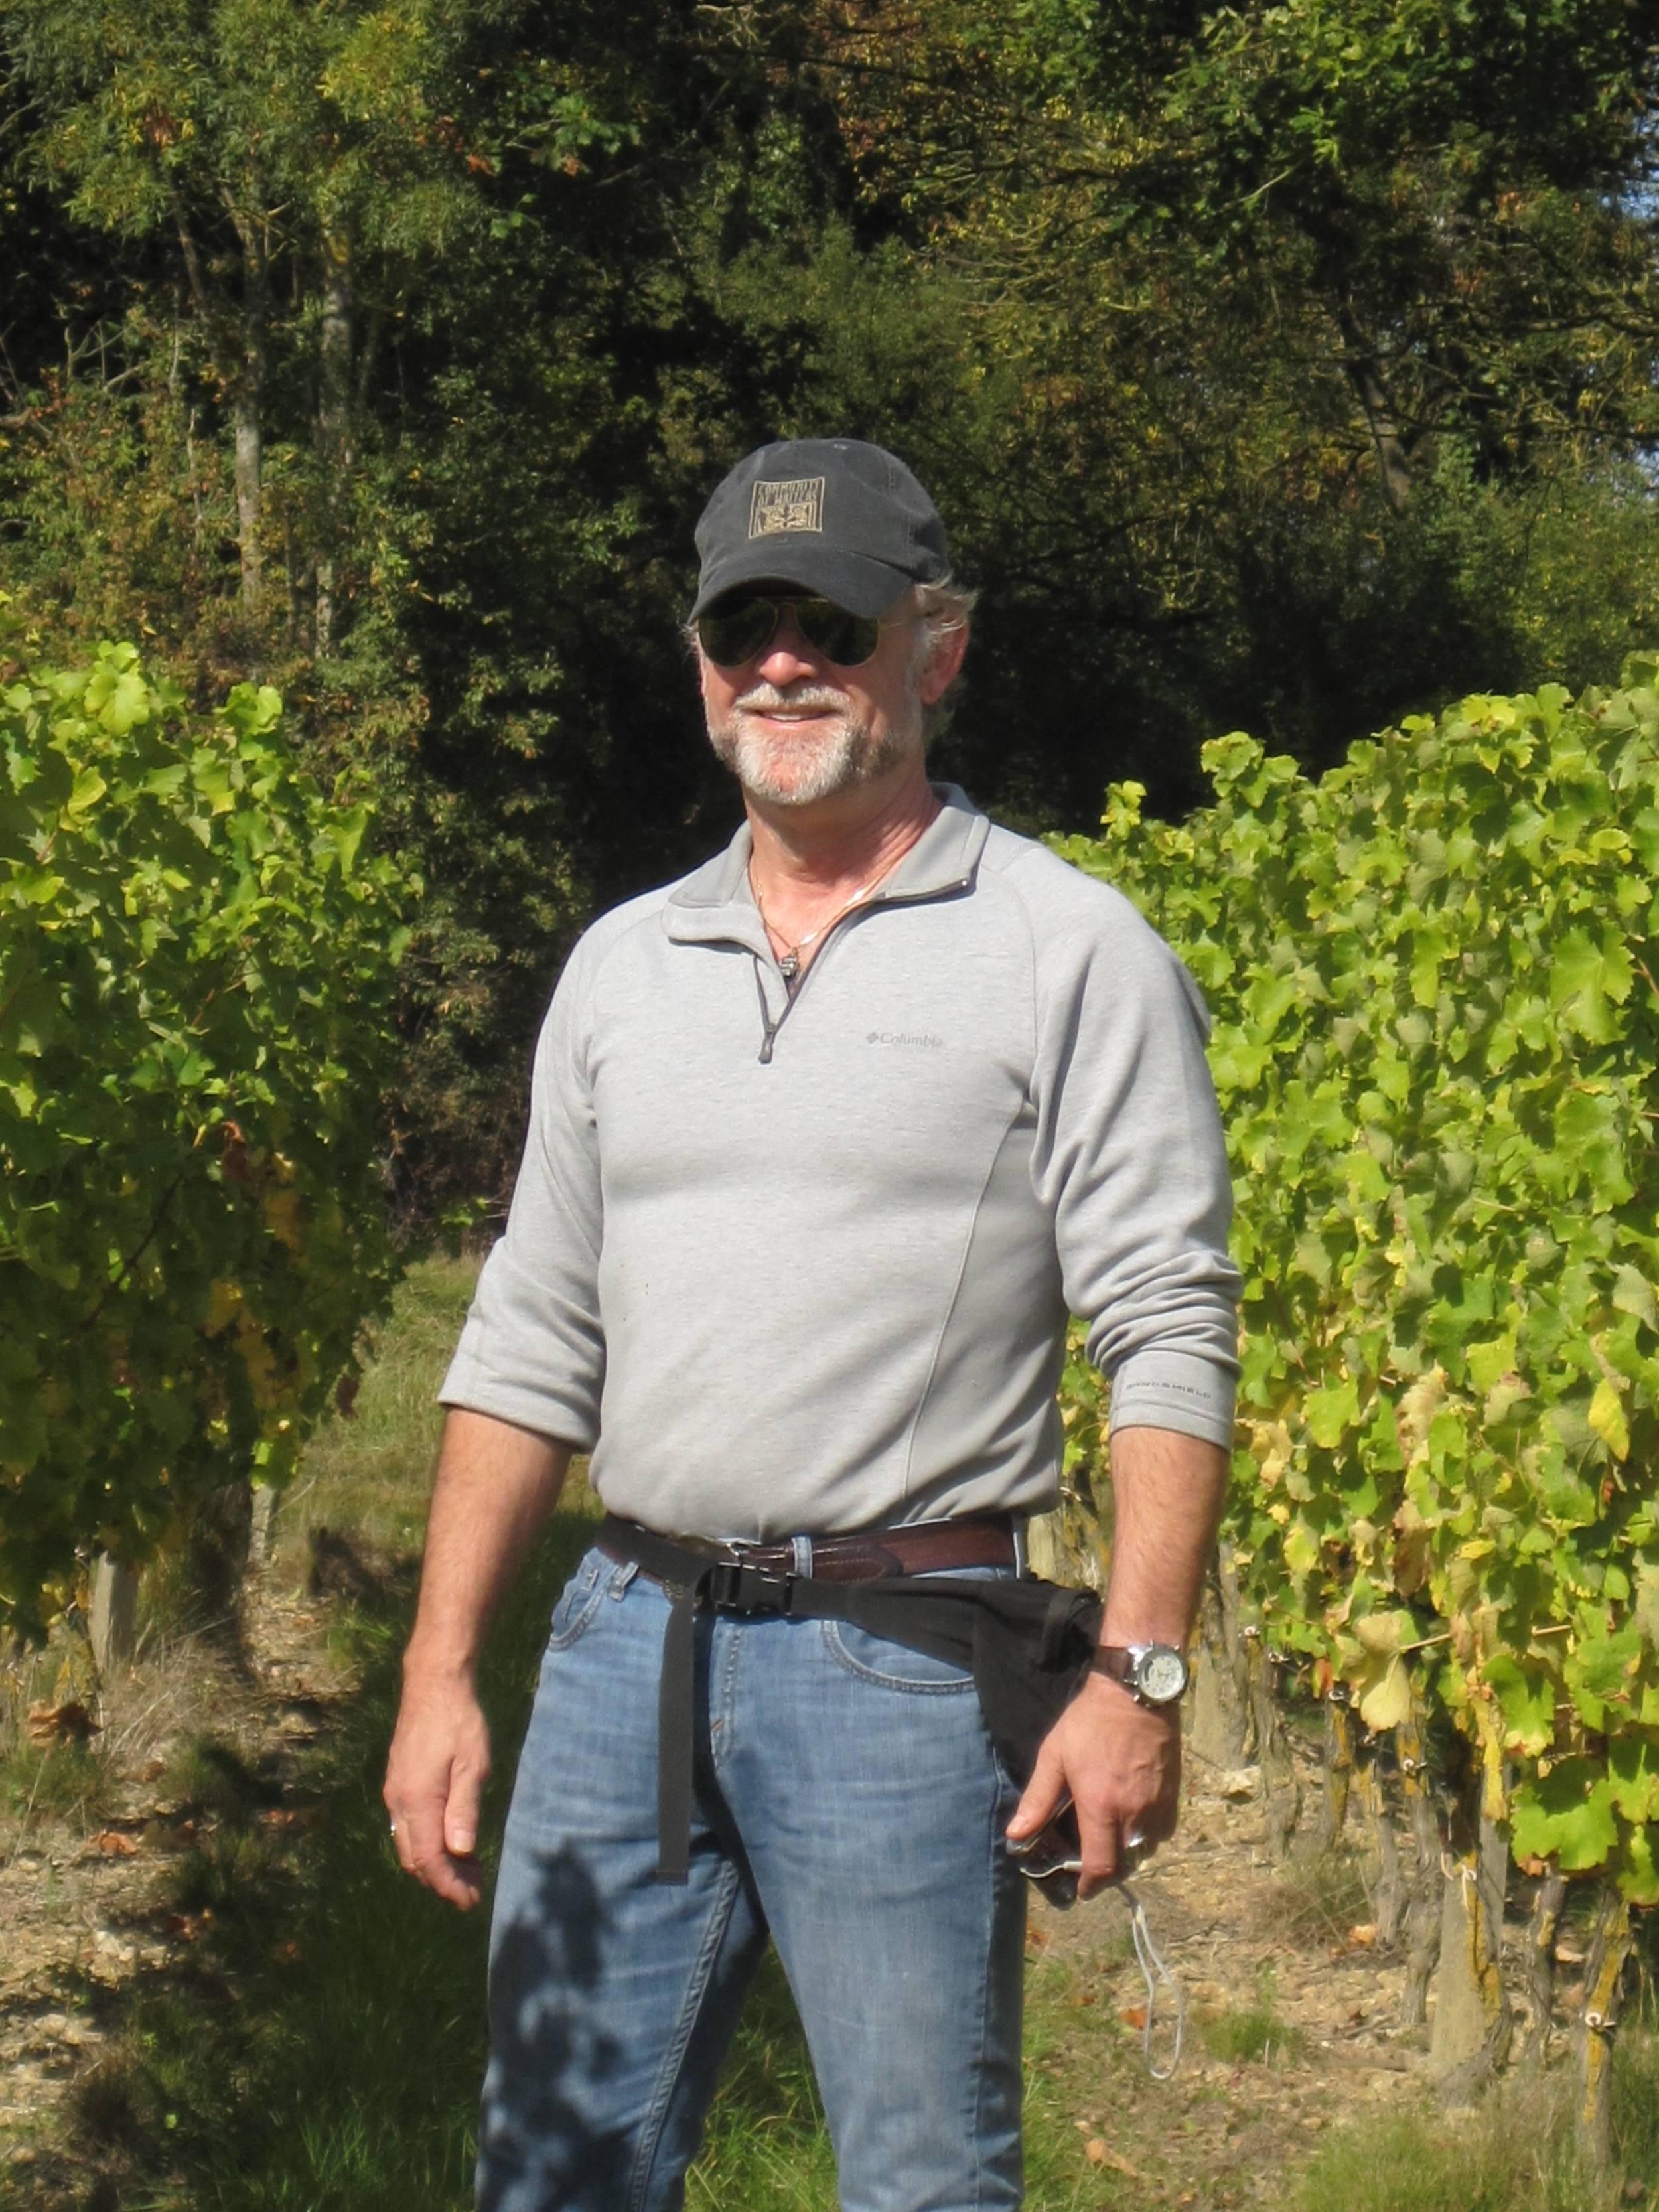 John among the vines